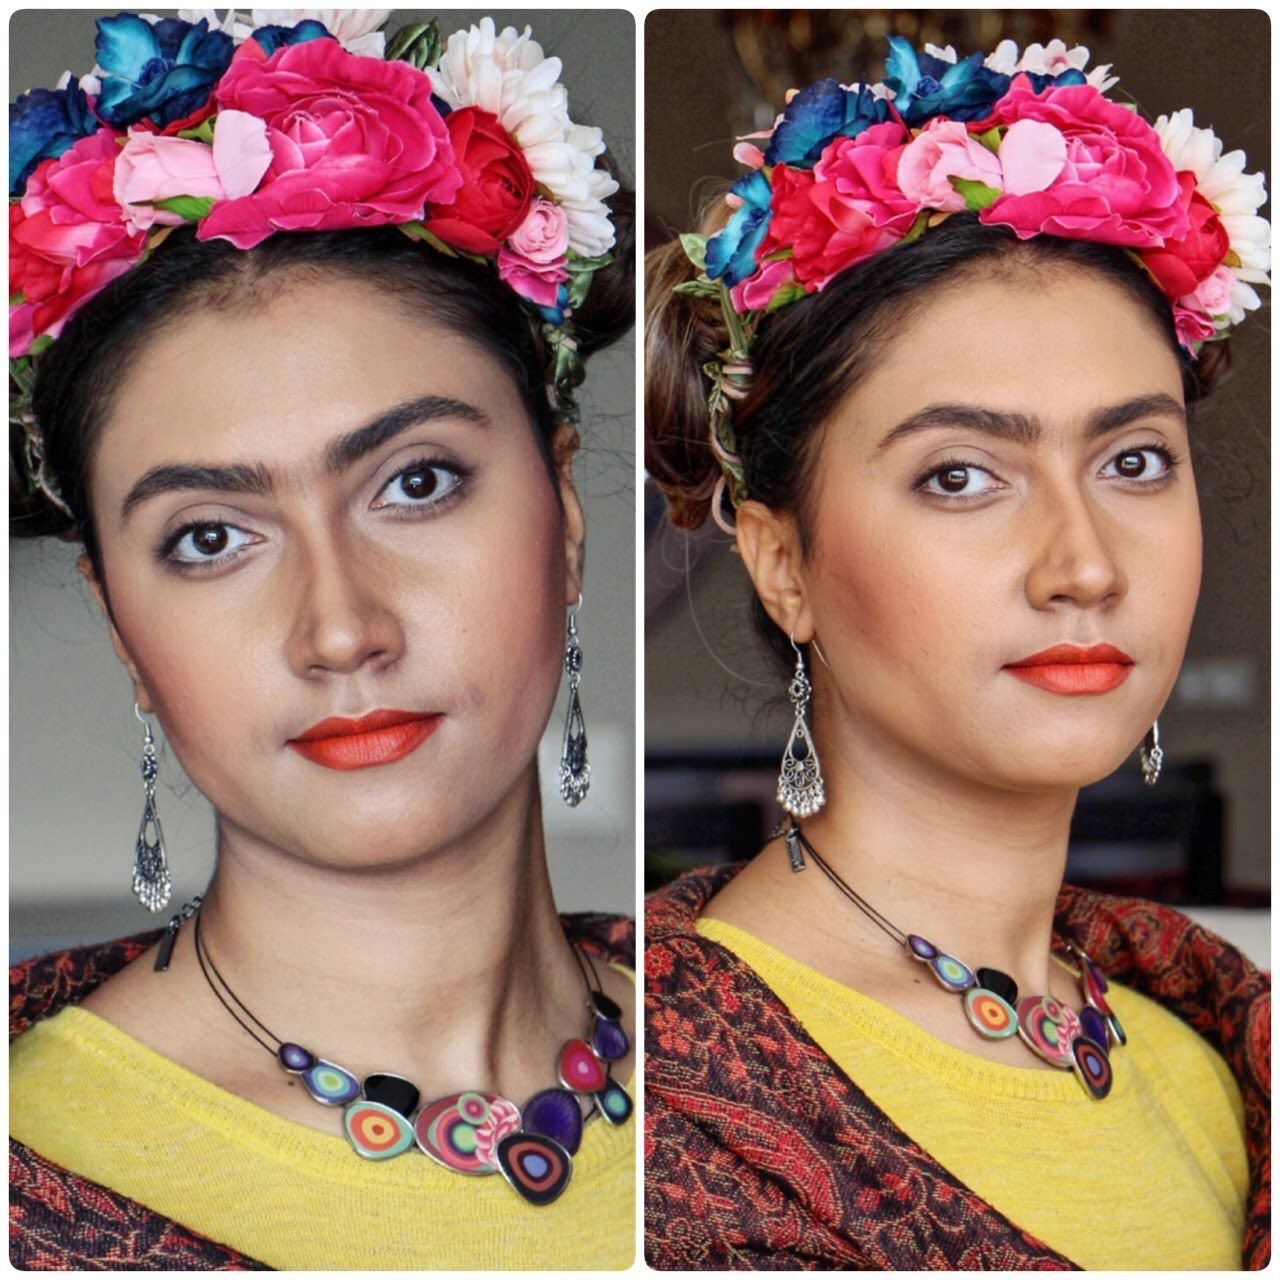 Frida Kahlo makeup and hair look Frida kahlo makeup